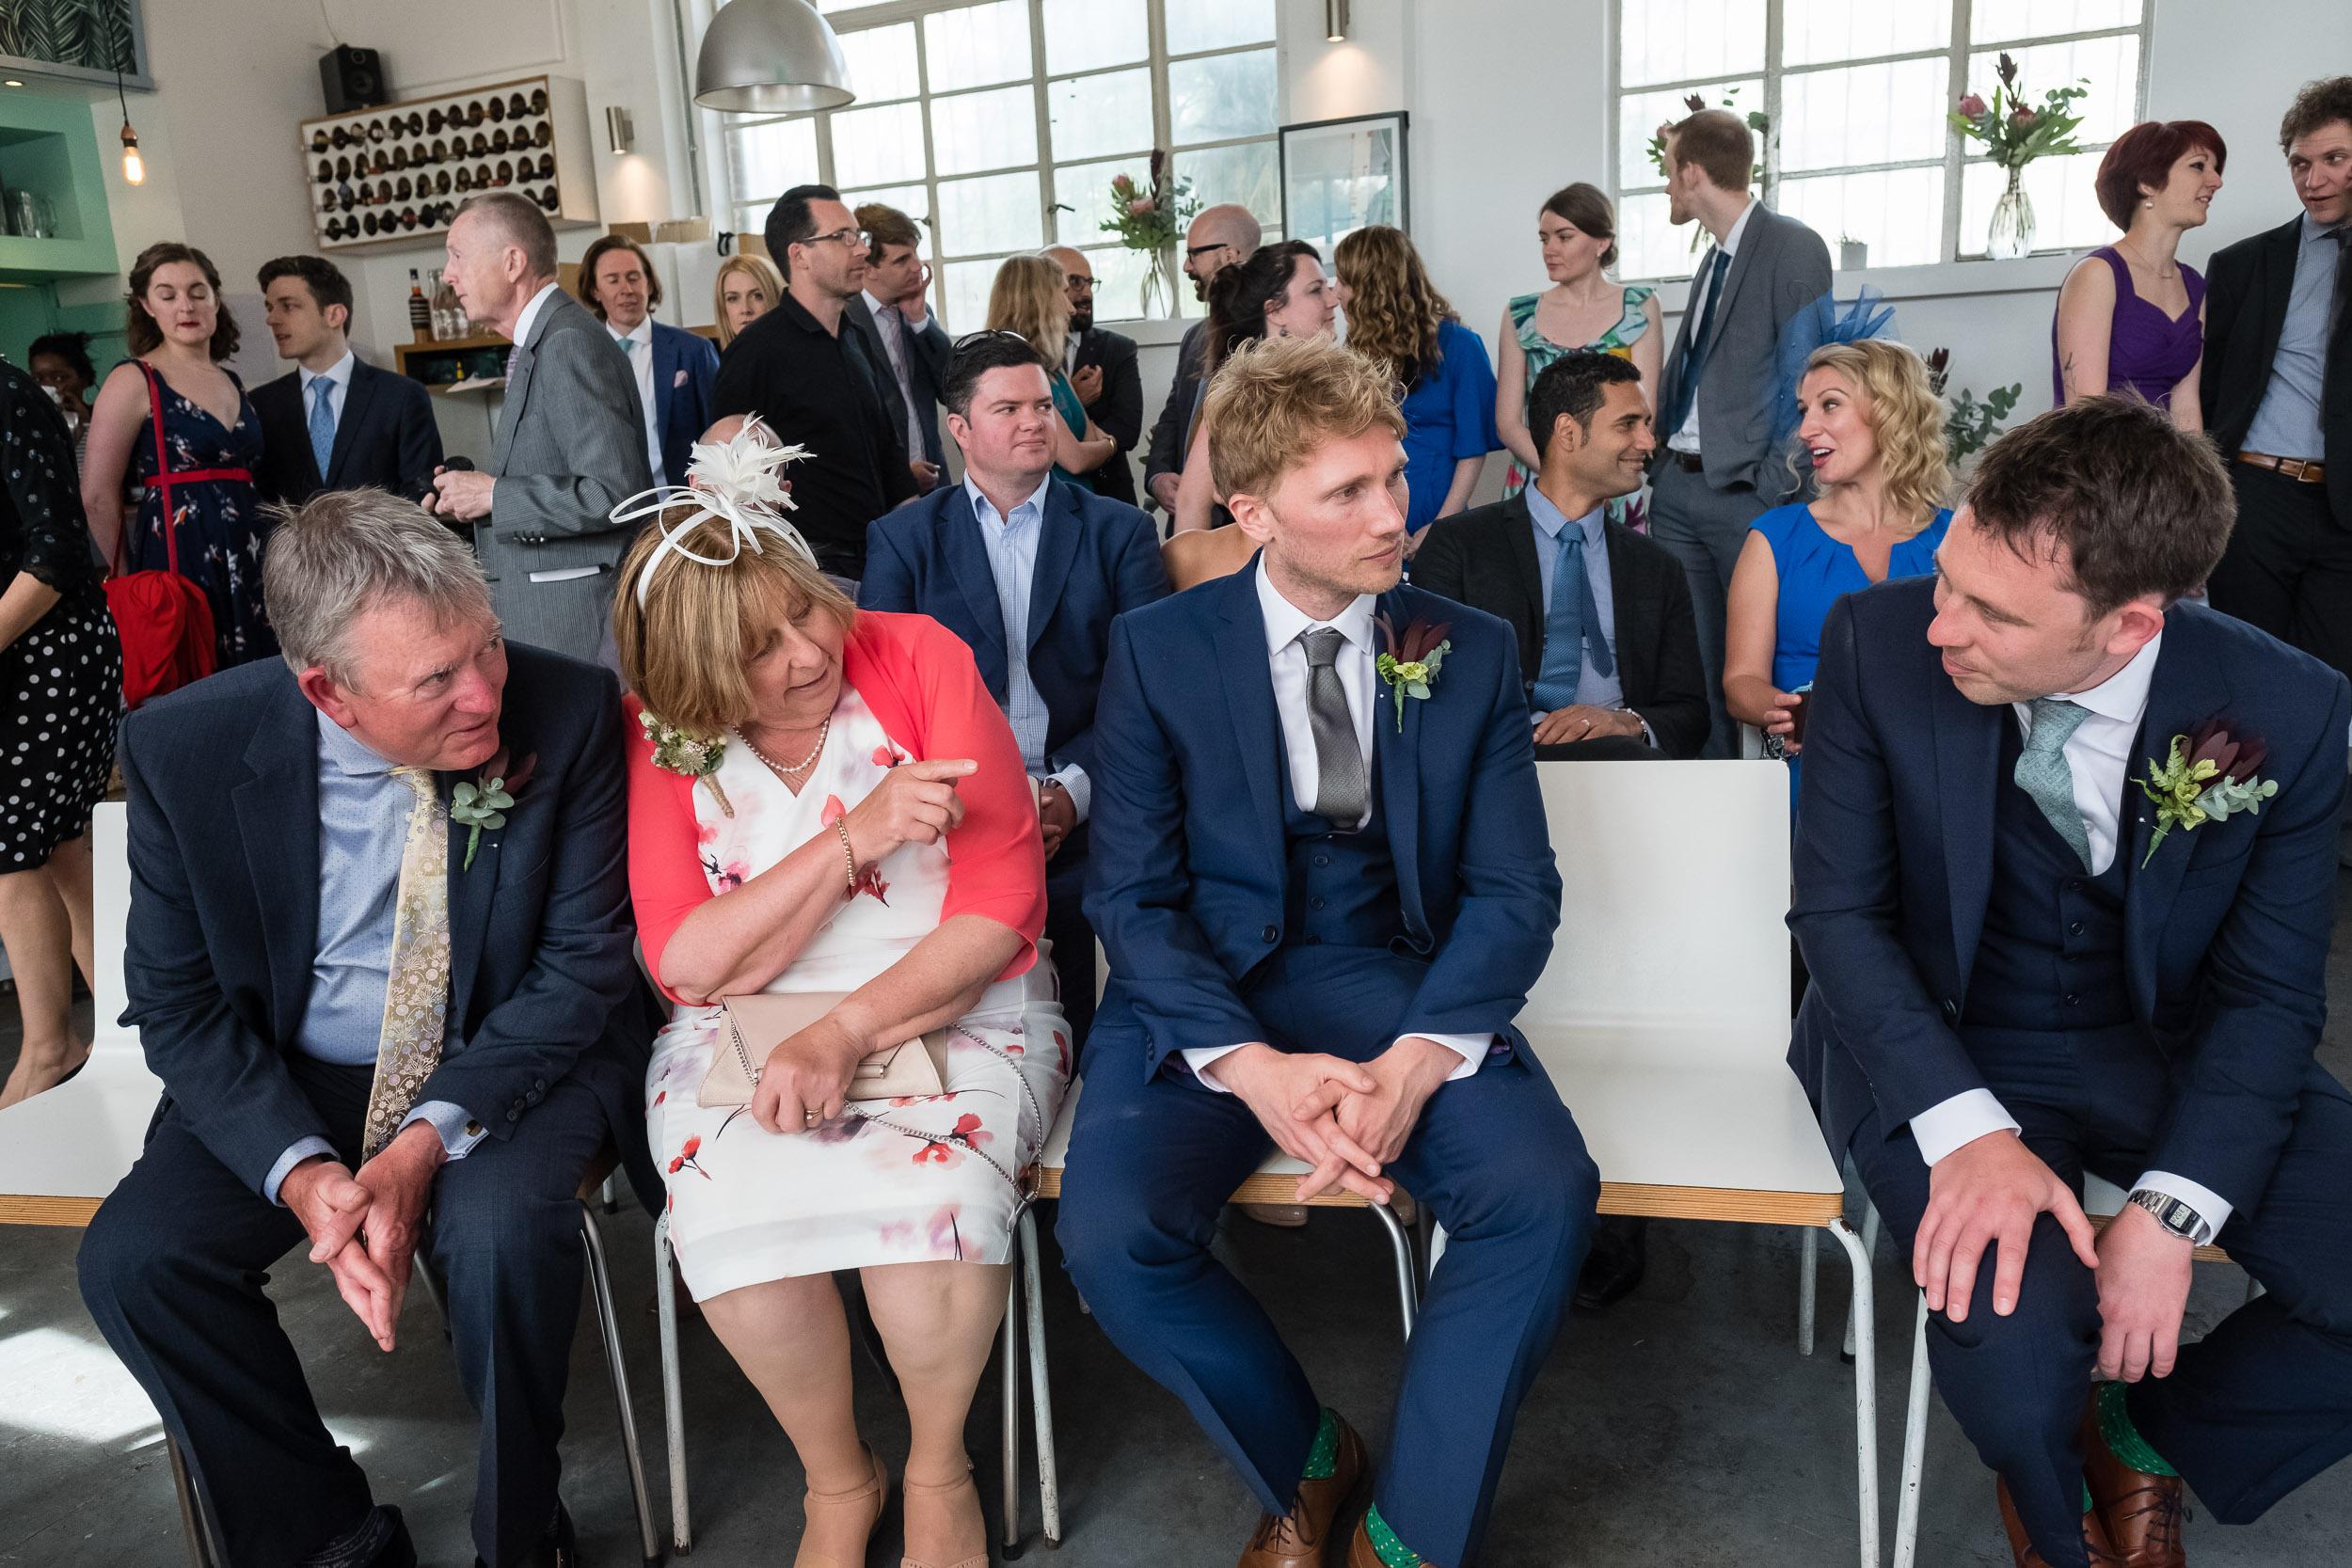 brockwell-lido-brixton-herne-hill-wedding-114.jpg